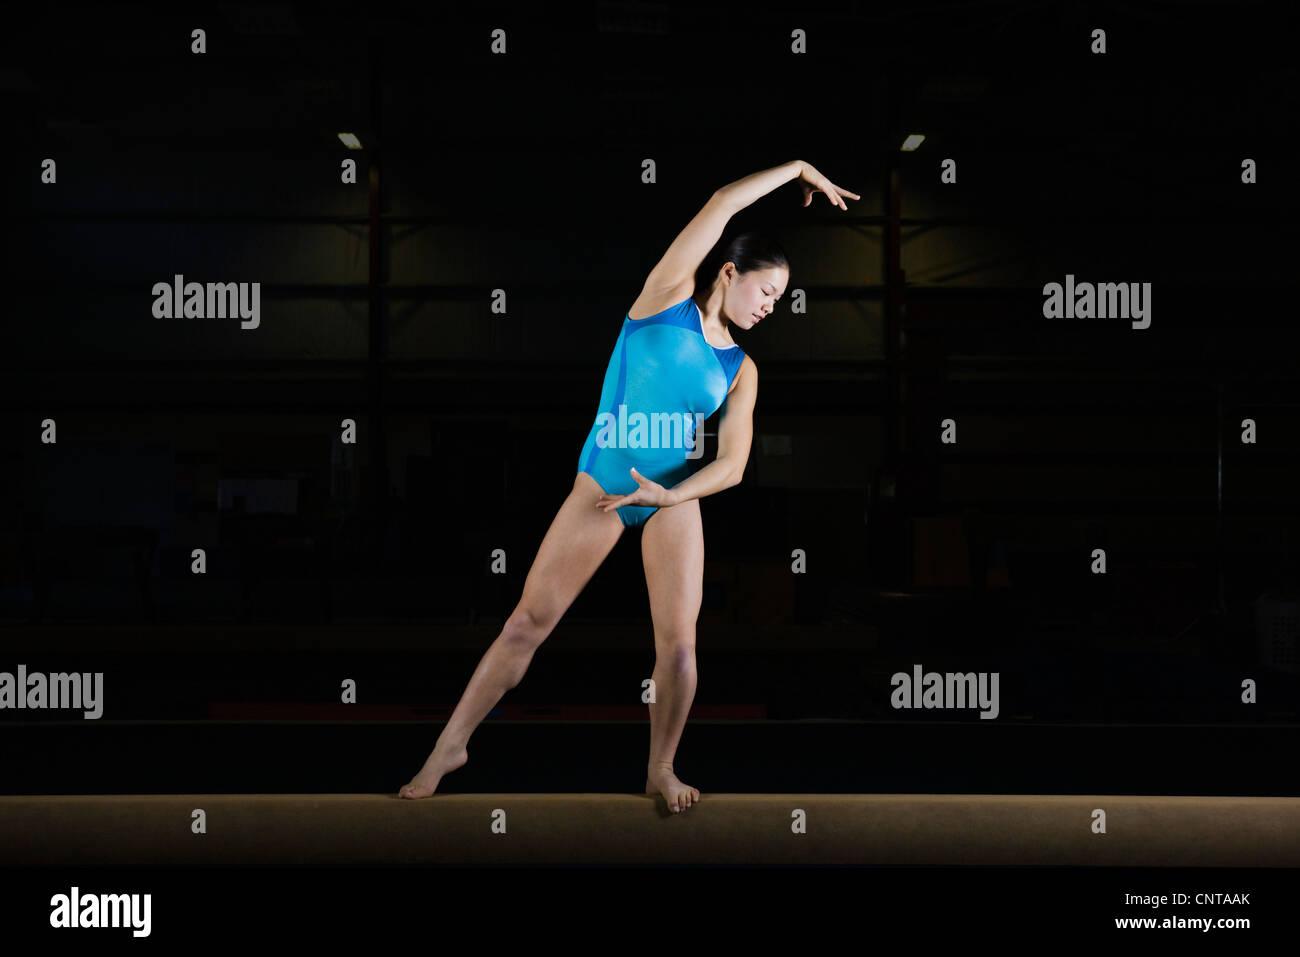 Teenage girl gymnast on balance beam - Stock Image